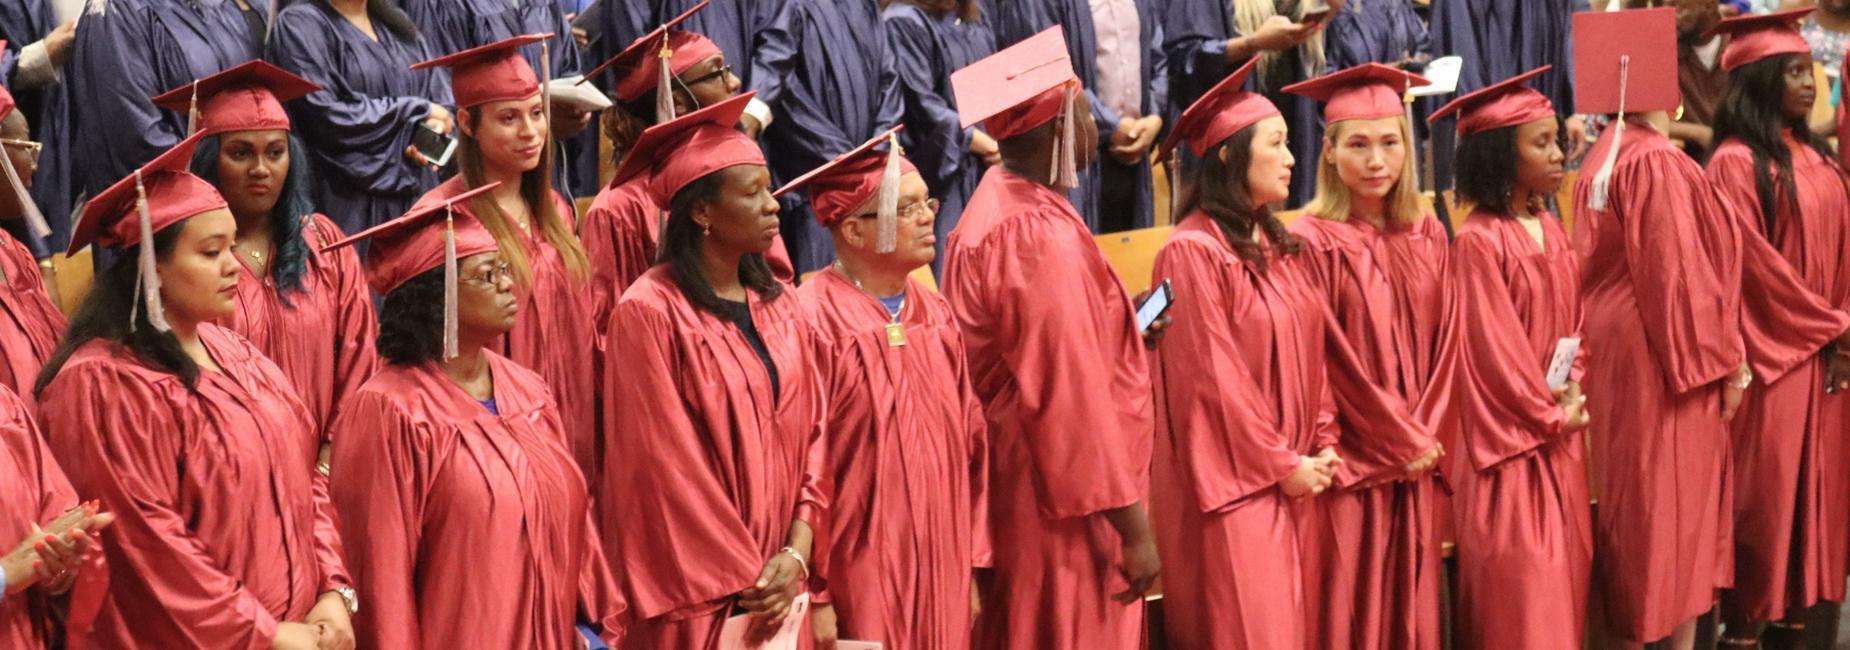 shuffle 1 - Graduation Ceremony